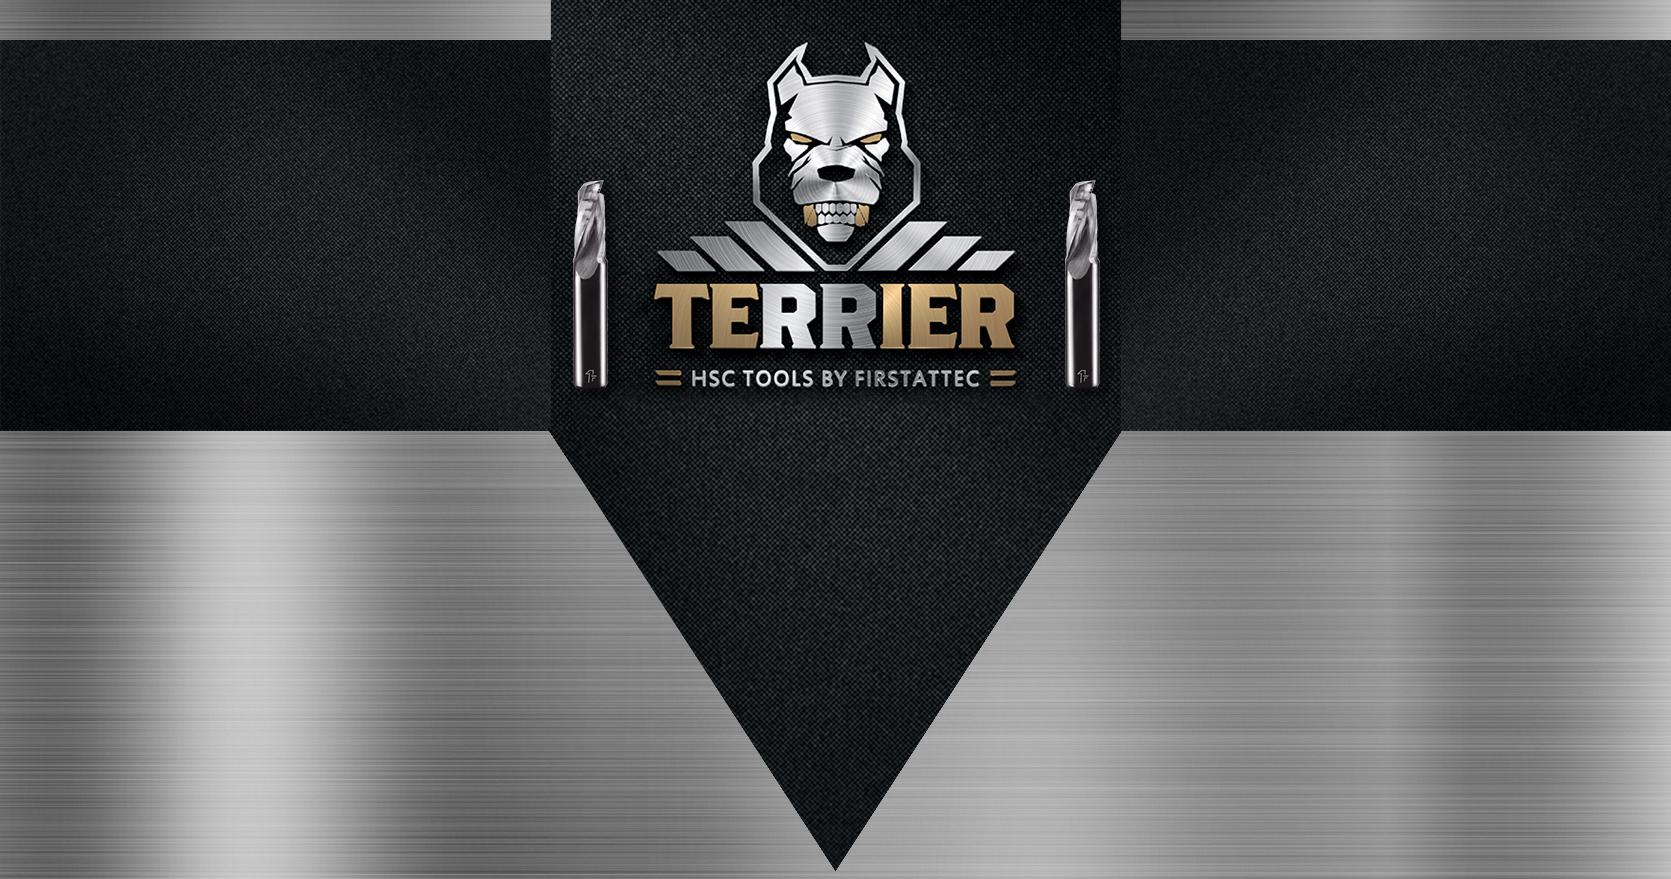 Terrier HSC Tool Fraeswerkzeug Logo